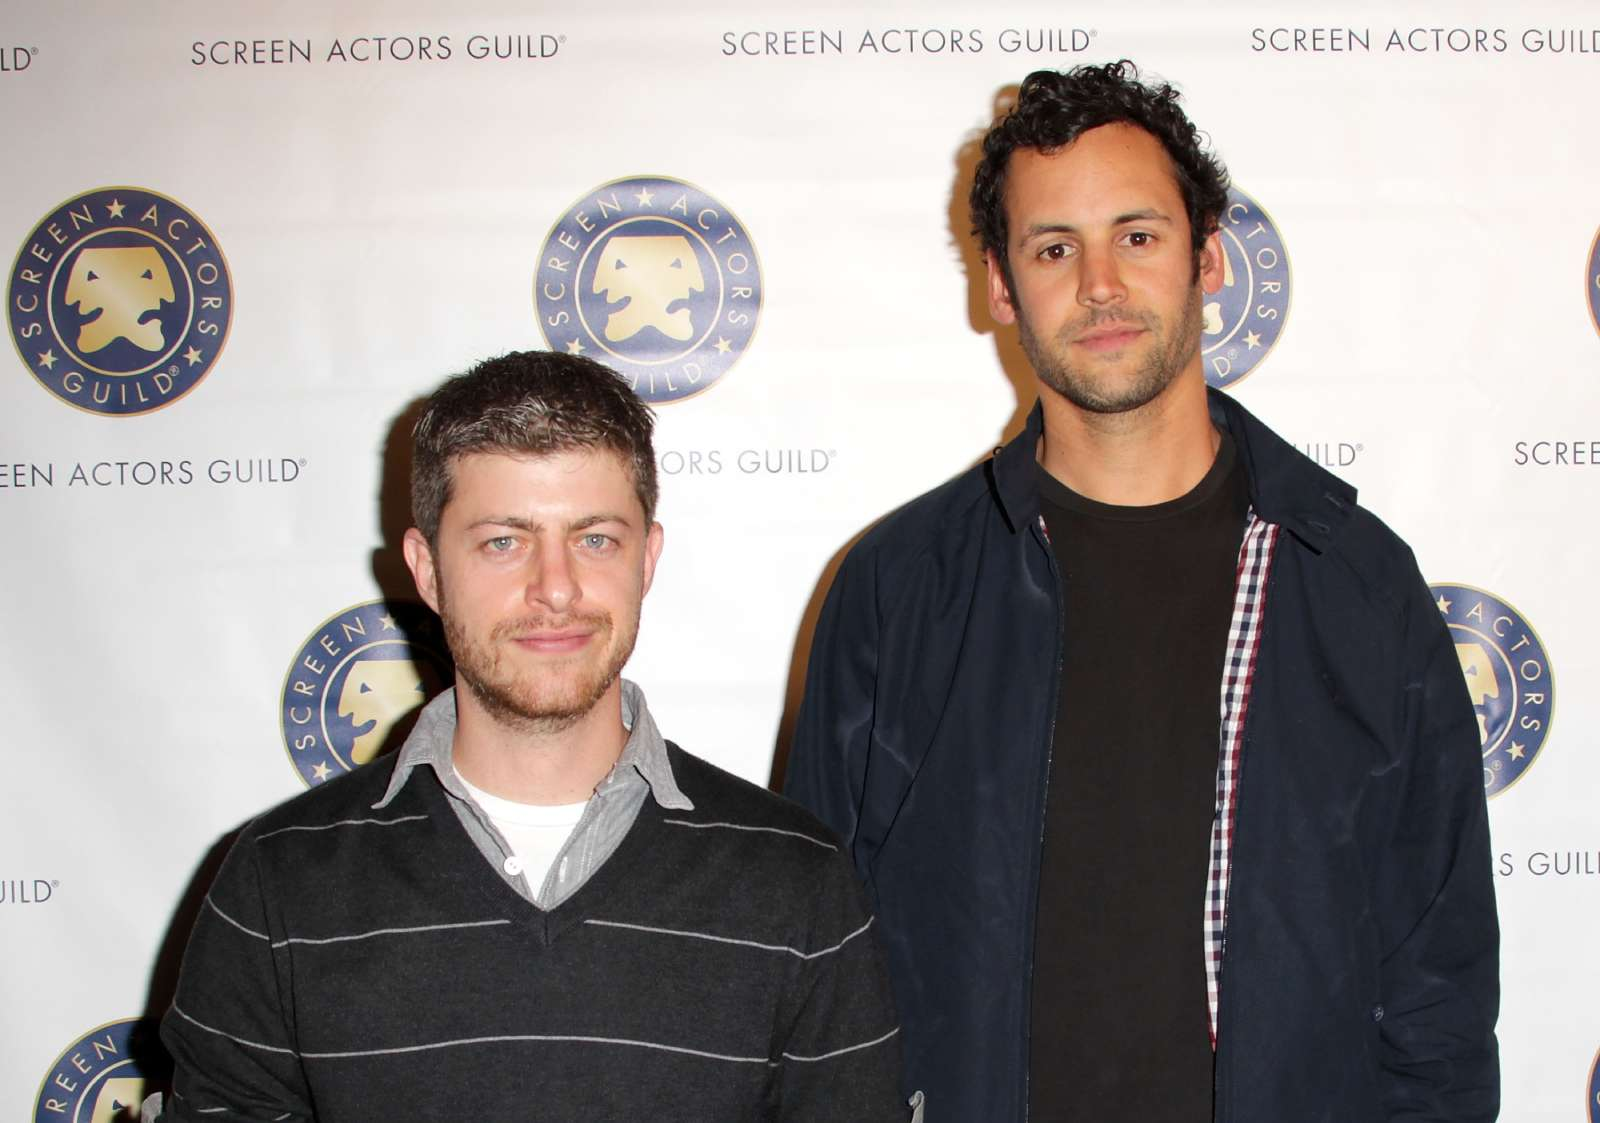 Oren Kaplan and actor Avi Rothman